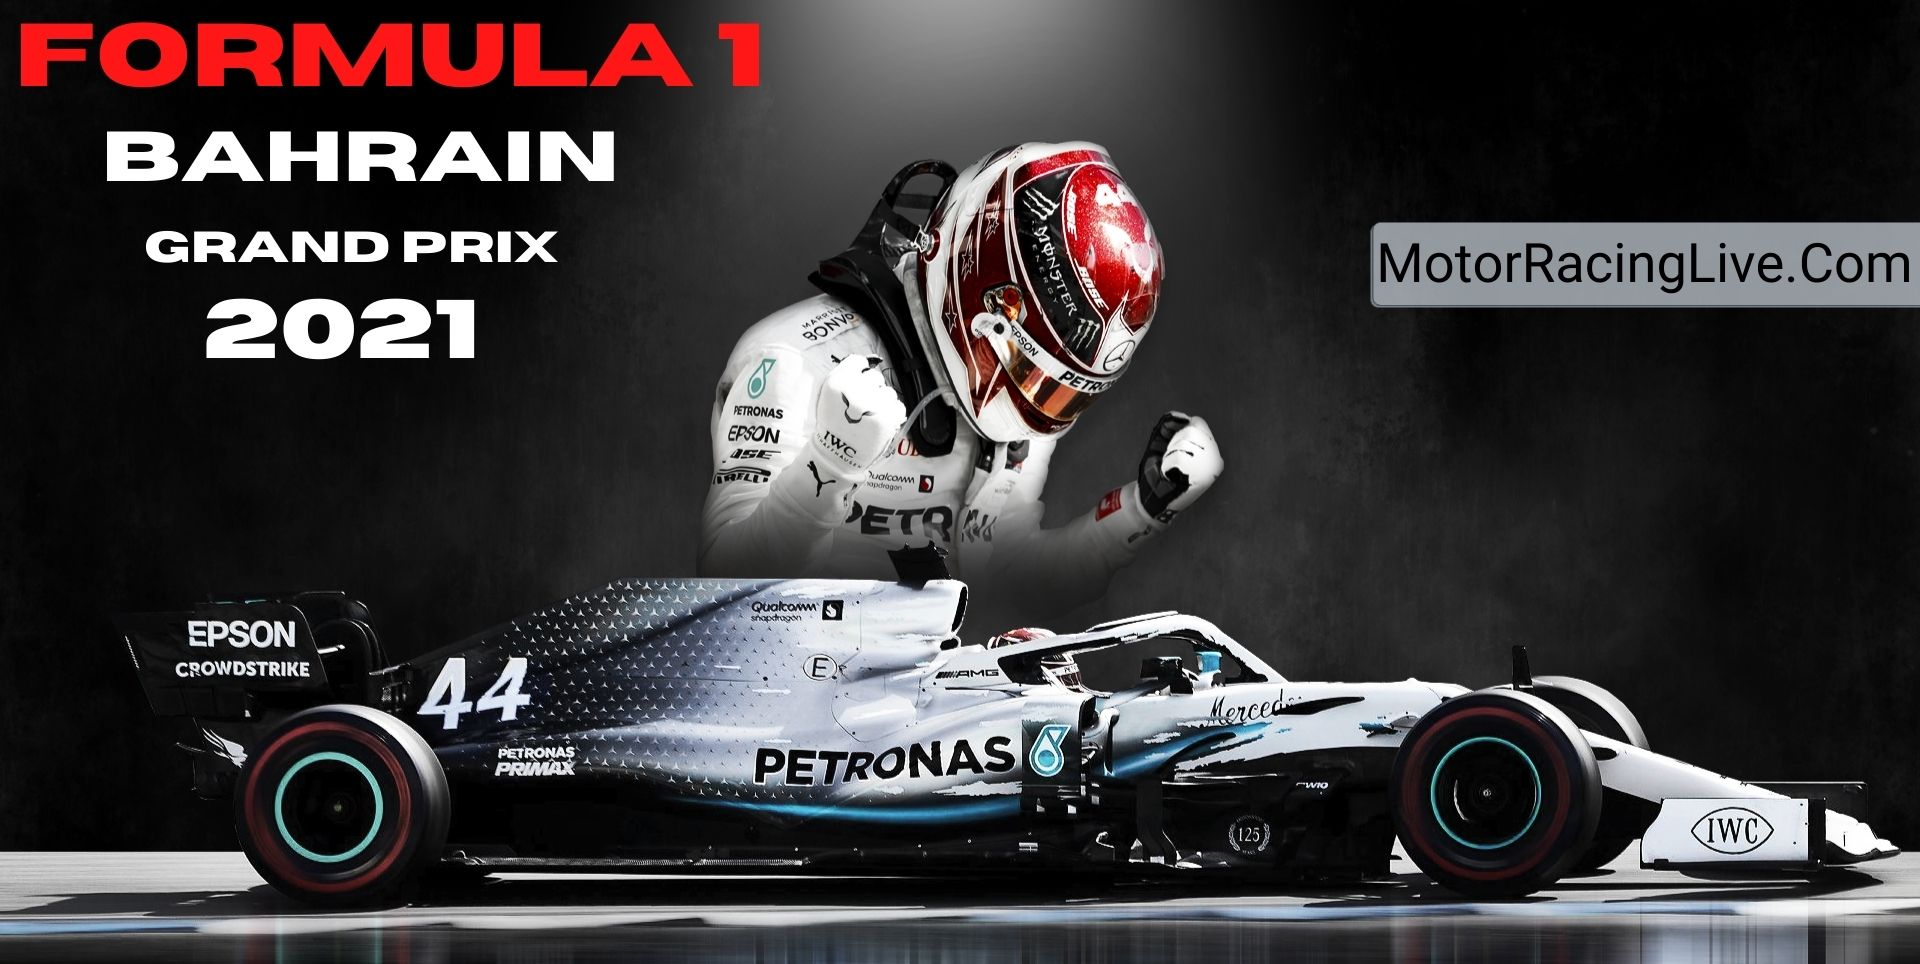 Bahrain F1 Grand Prix Live Streaming 2021 | Full Race Replay